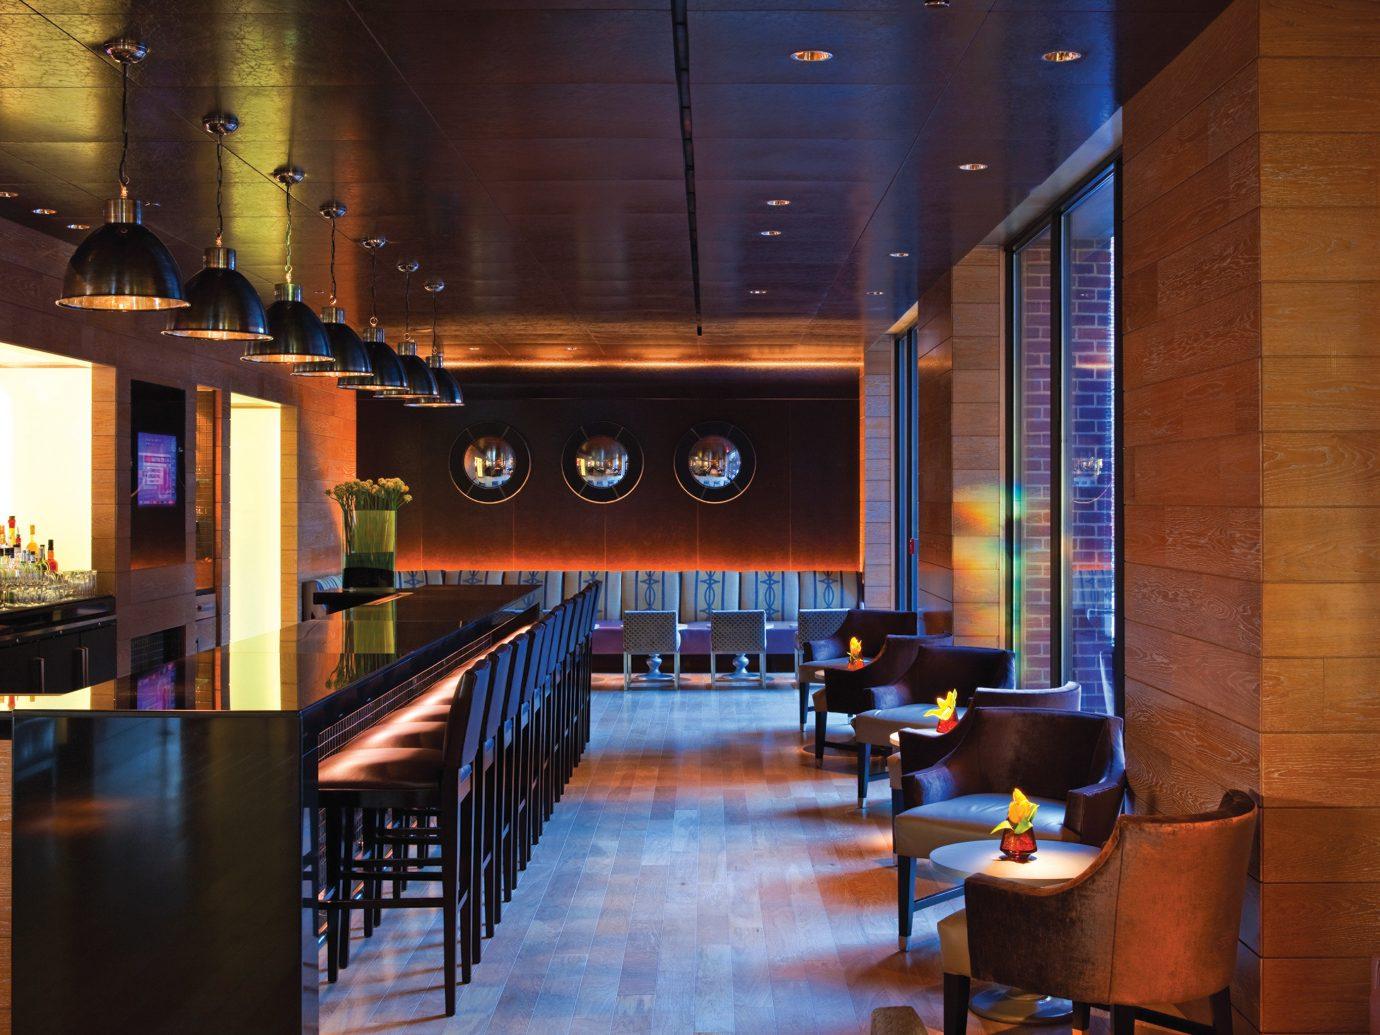 Bar Dining Drink Eat Elegant Hip Hotels Luxury Modern indoor floor table room Living ceiling interior design lighting Lobby restaurant furniture area